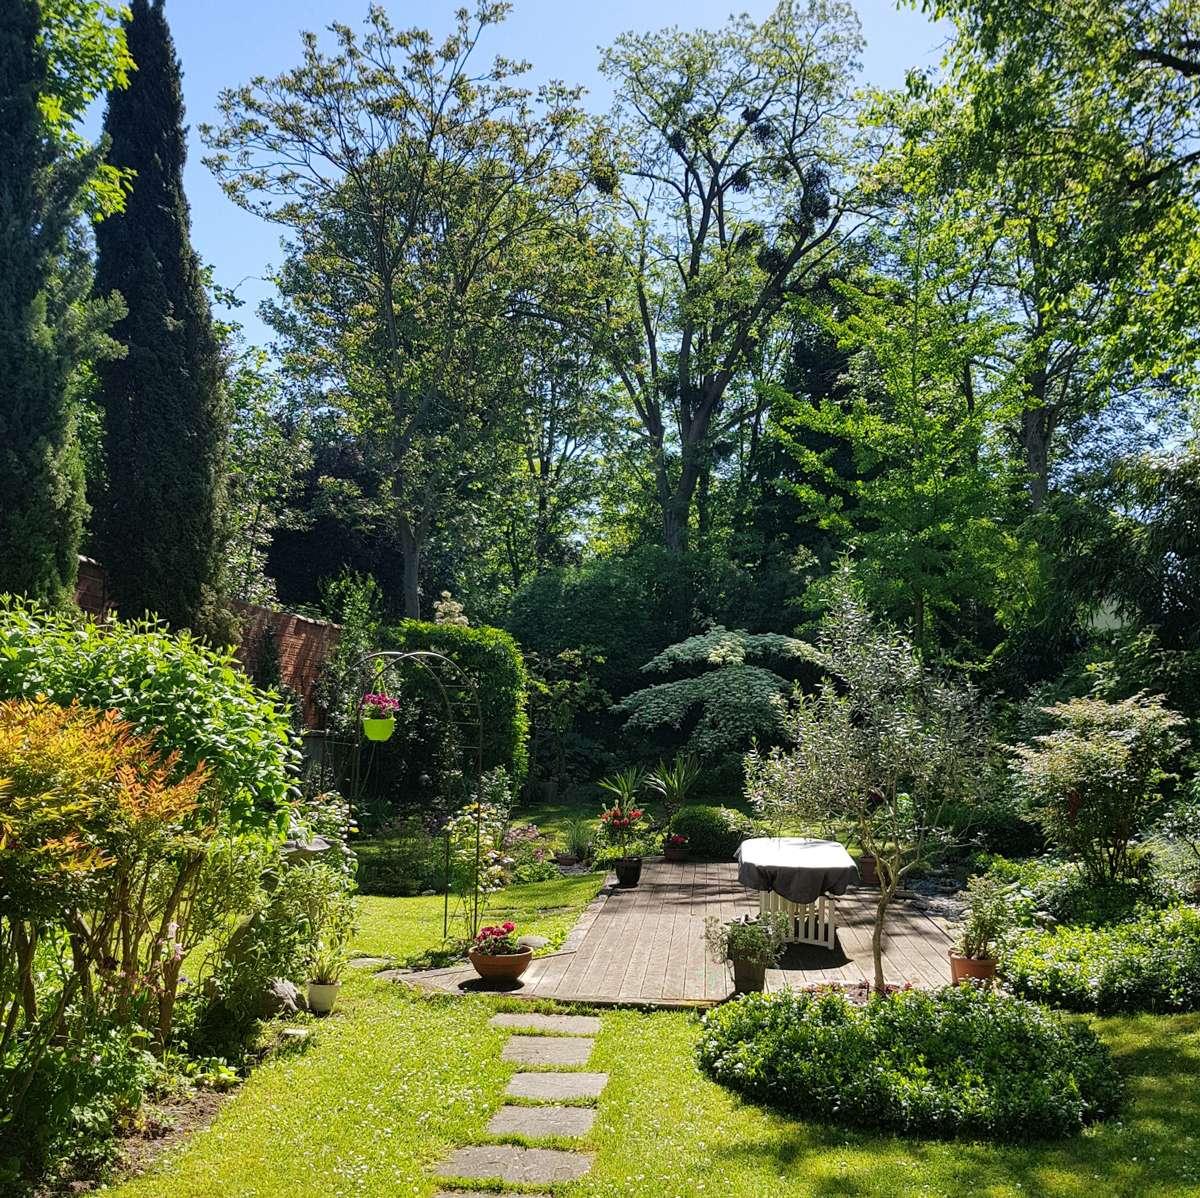 Comment Arroser Jardin Pendant Vacances entretien de jardin - astuces de jardinier paysagiste